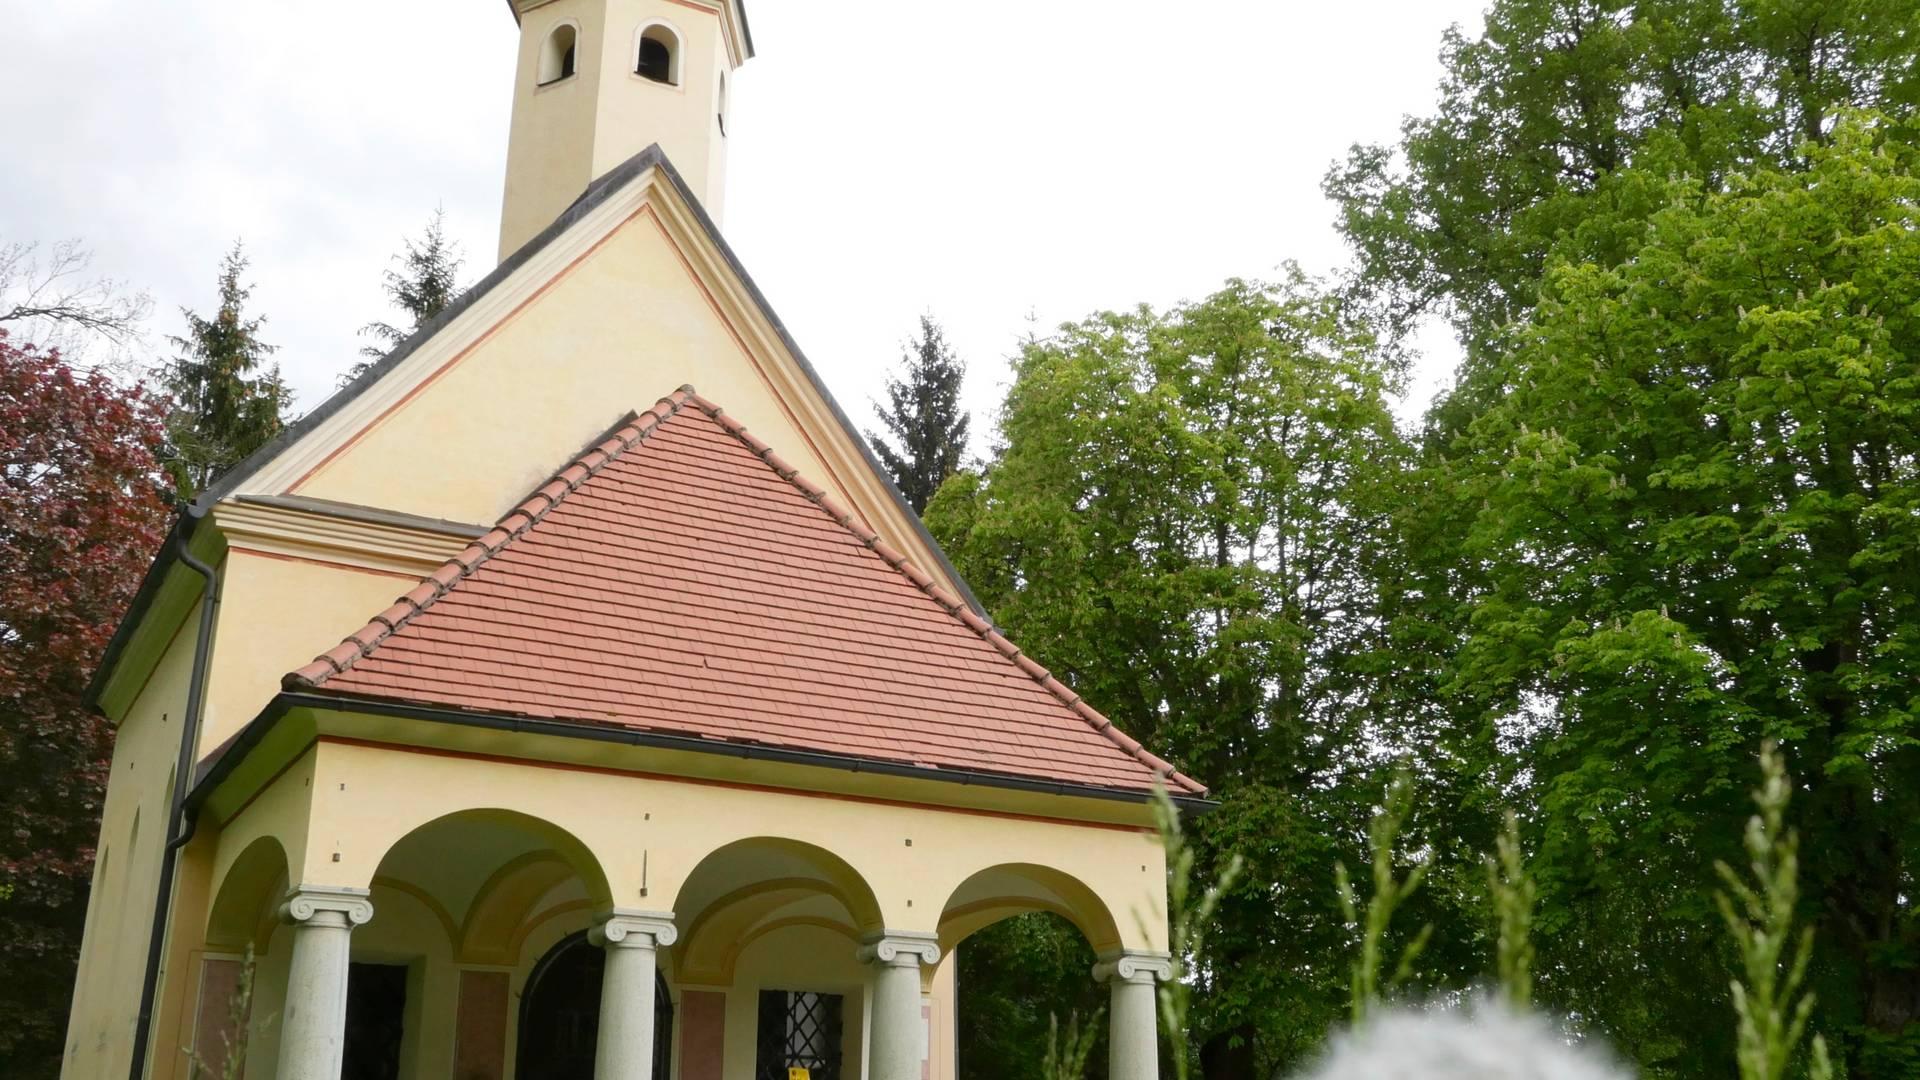 Wolschartkirche, St. Georgen am Längsee